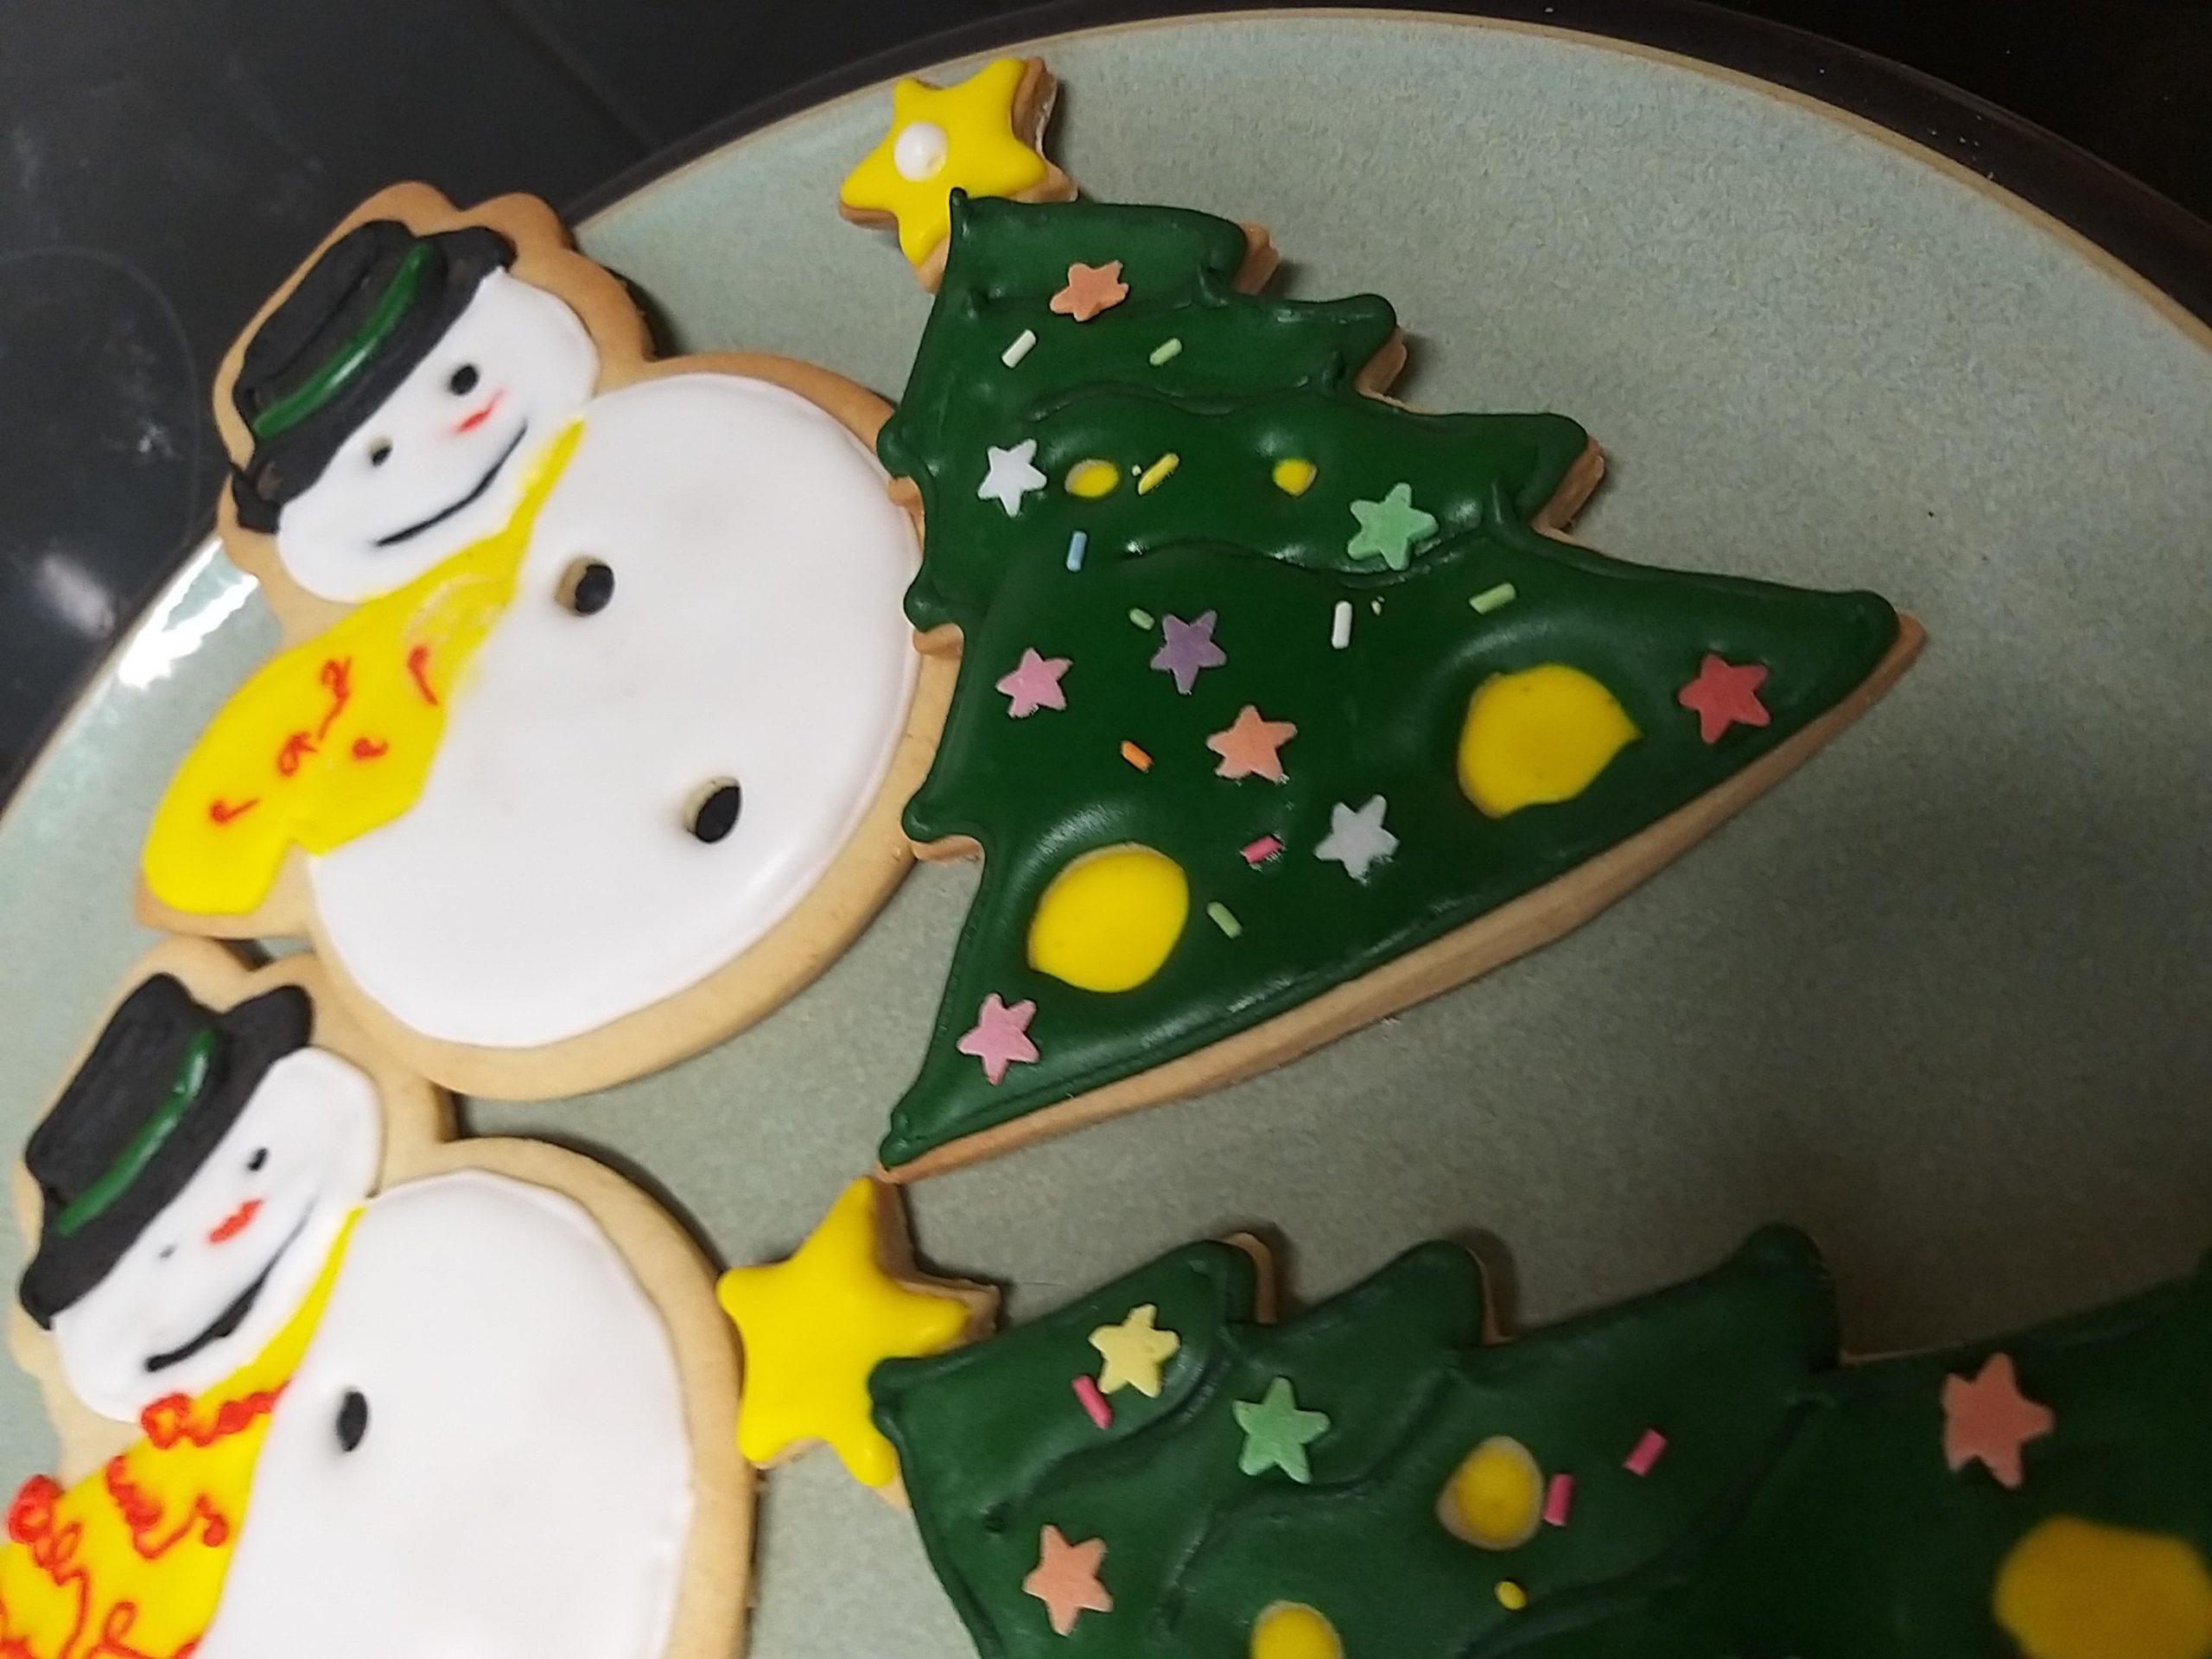 decorated-xmas-cookies